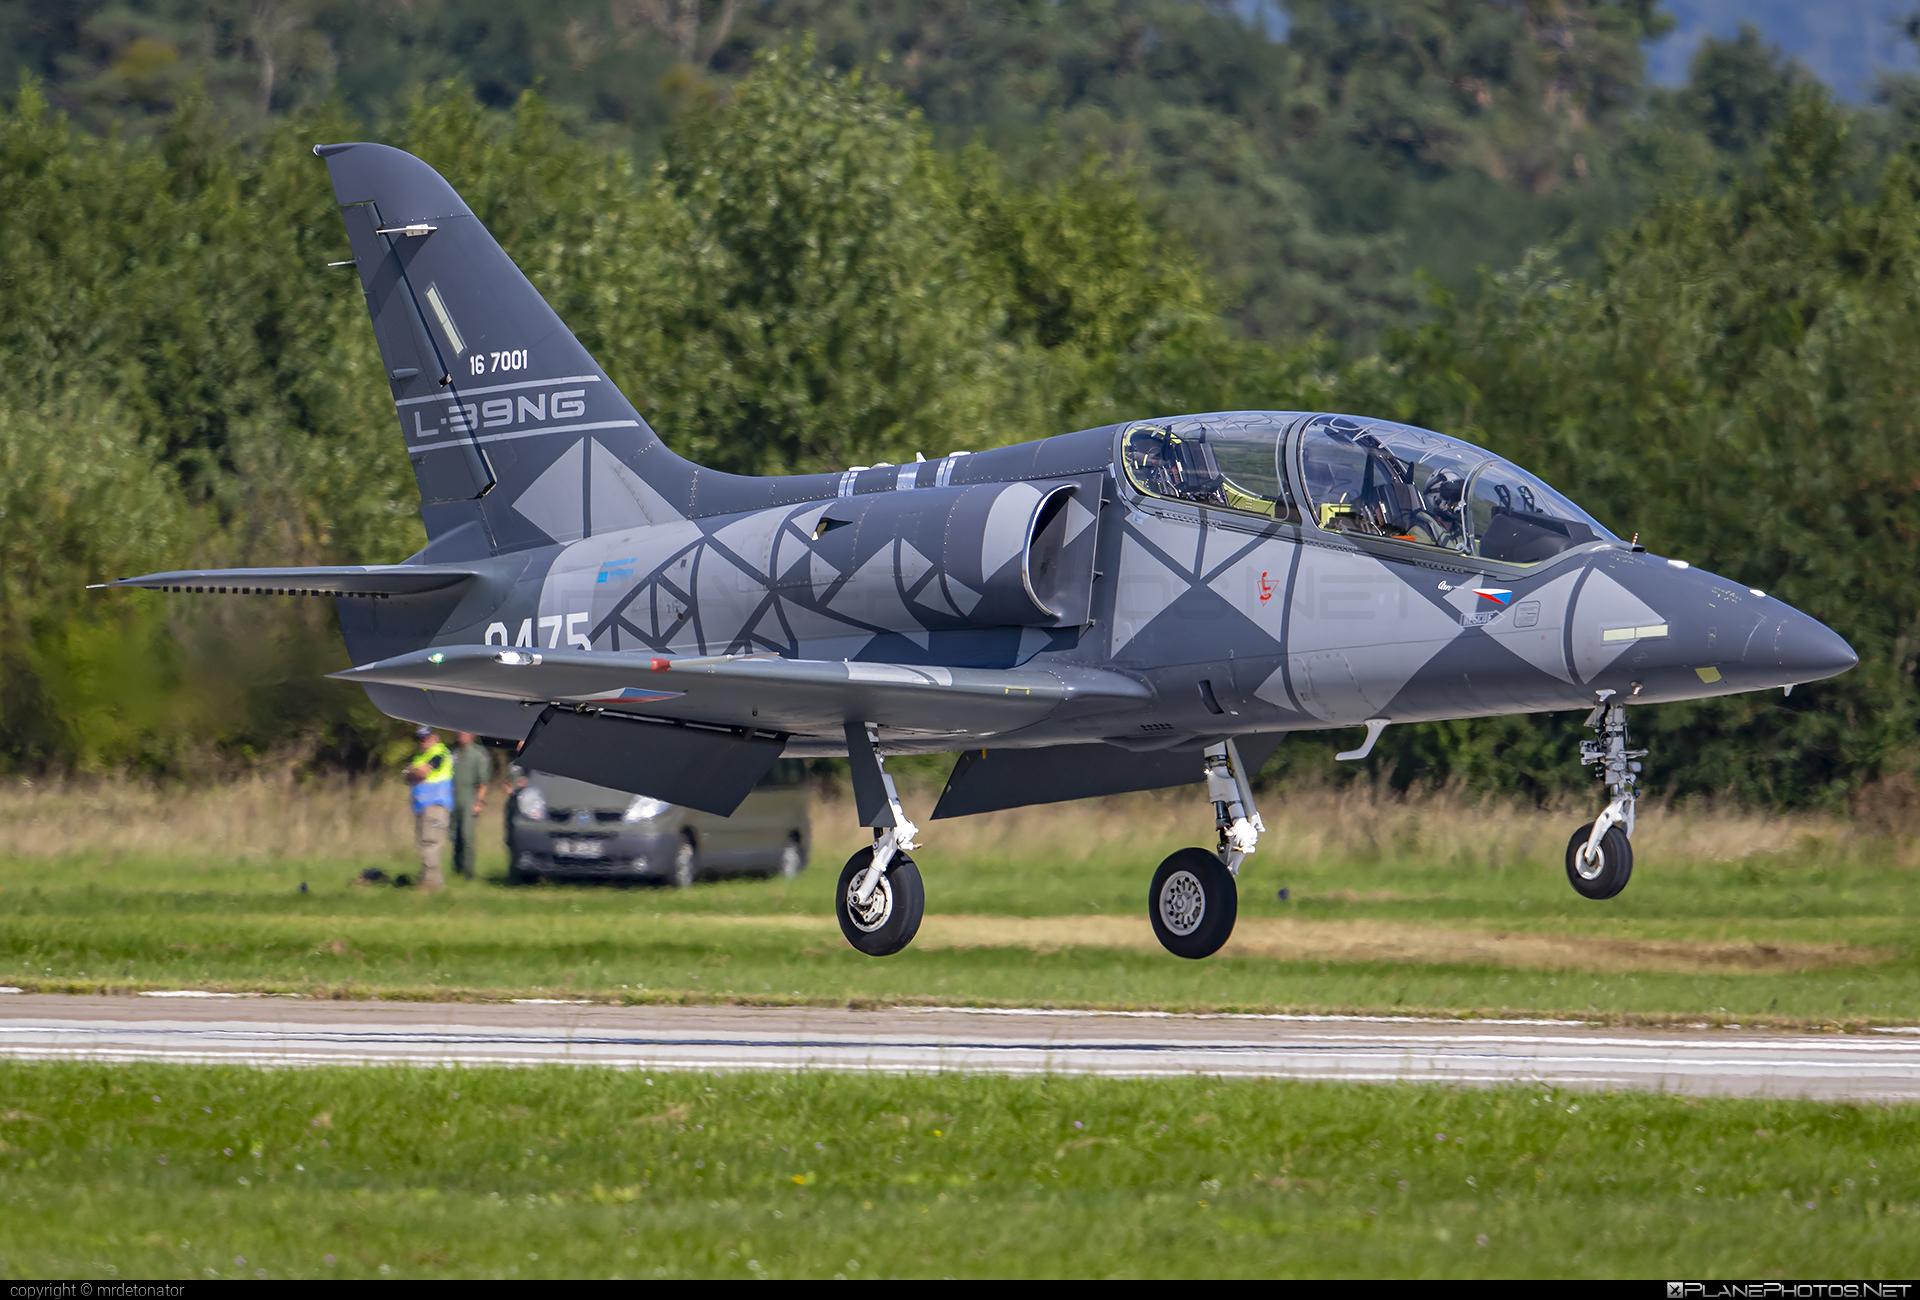 Aero L-39NG - 0475 operated by Aero Vodochody #aero #aerol39 #aerol39ng #aerovodochody #l39 #l39ng